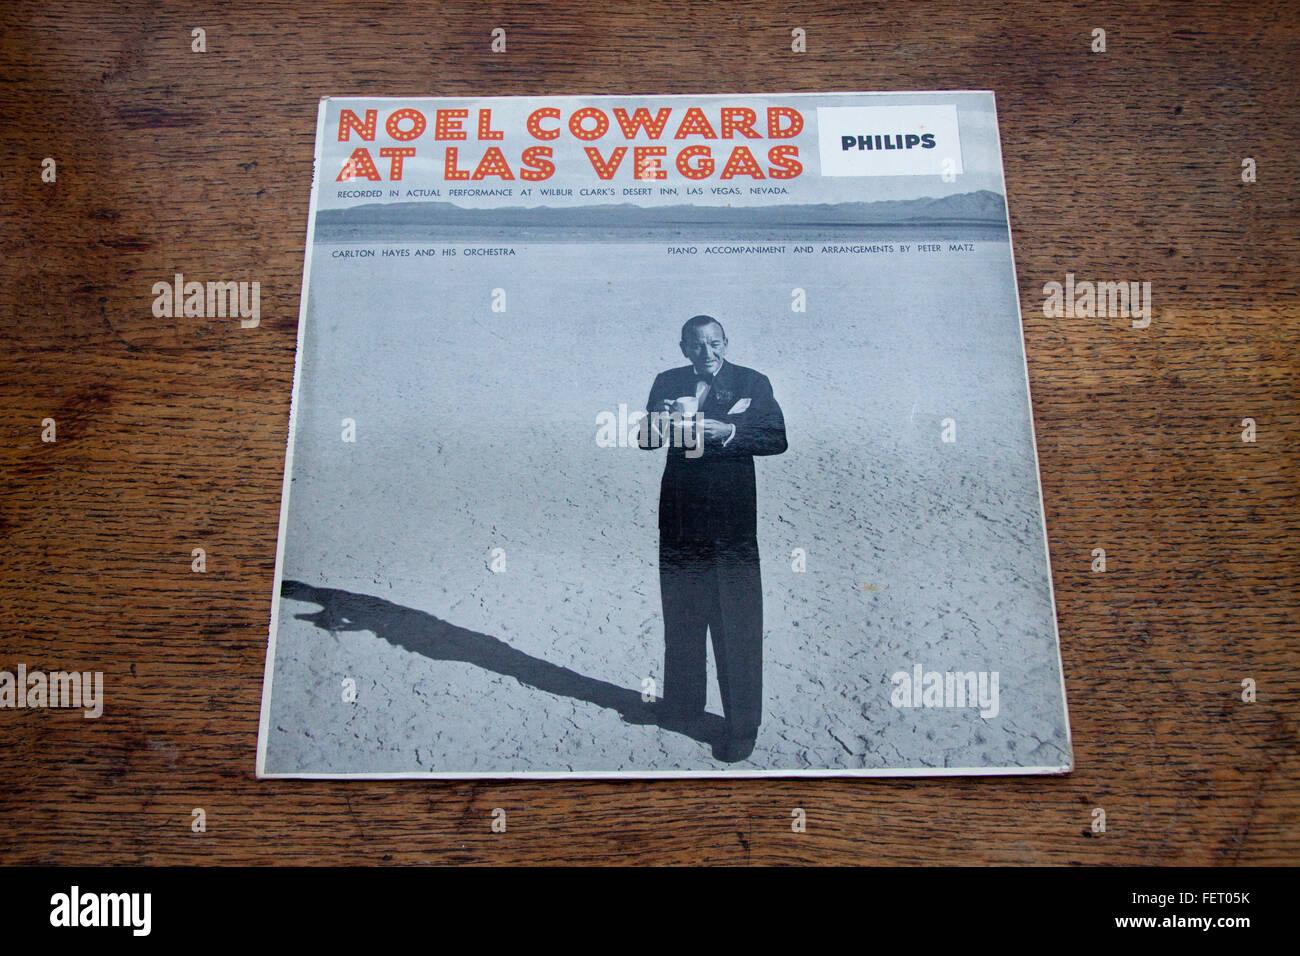 Front cover of Noel Coward's 1955 live album Noel Coward At Las